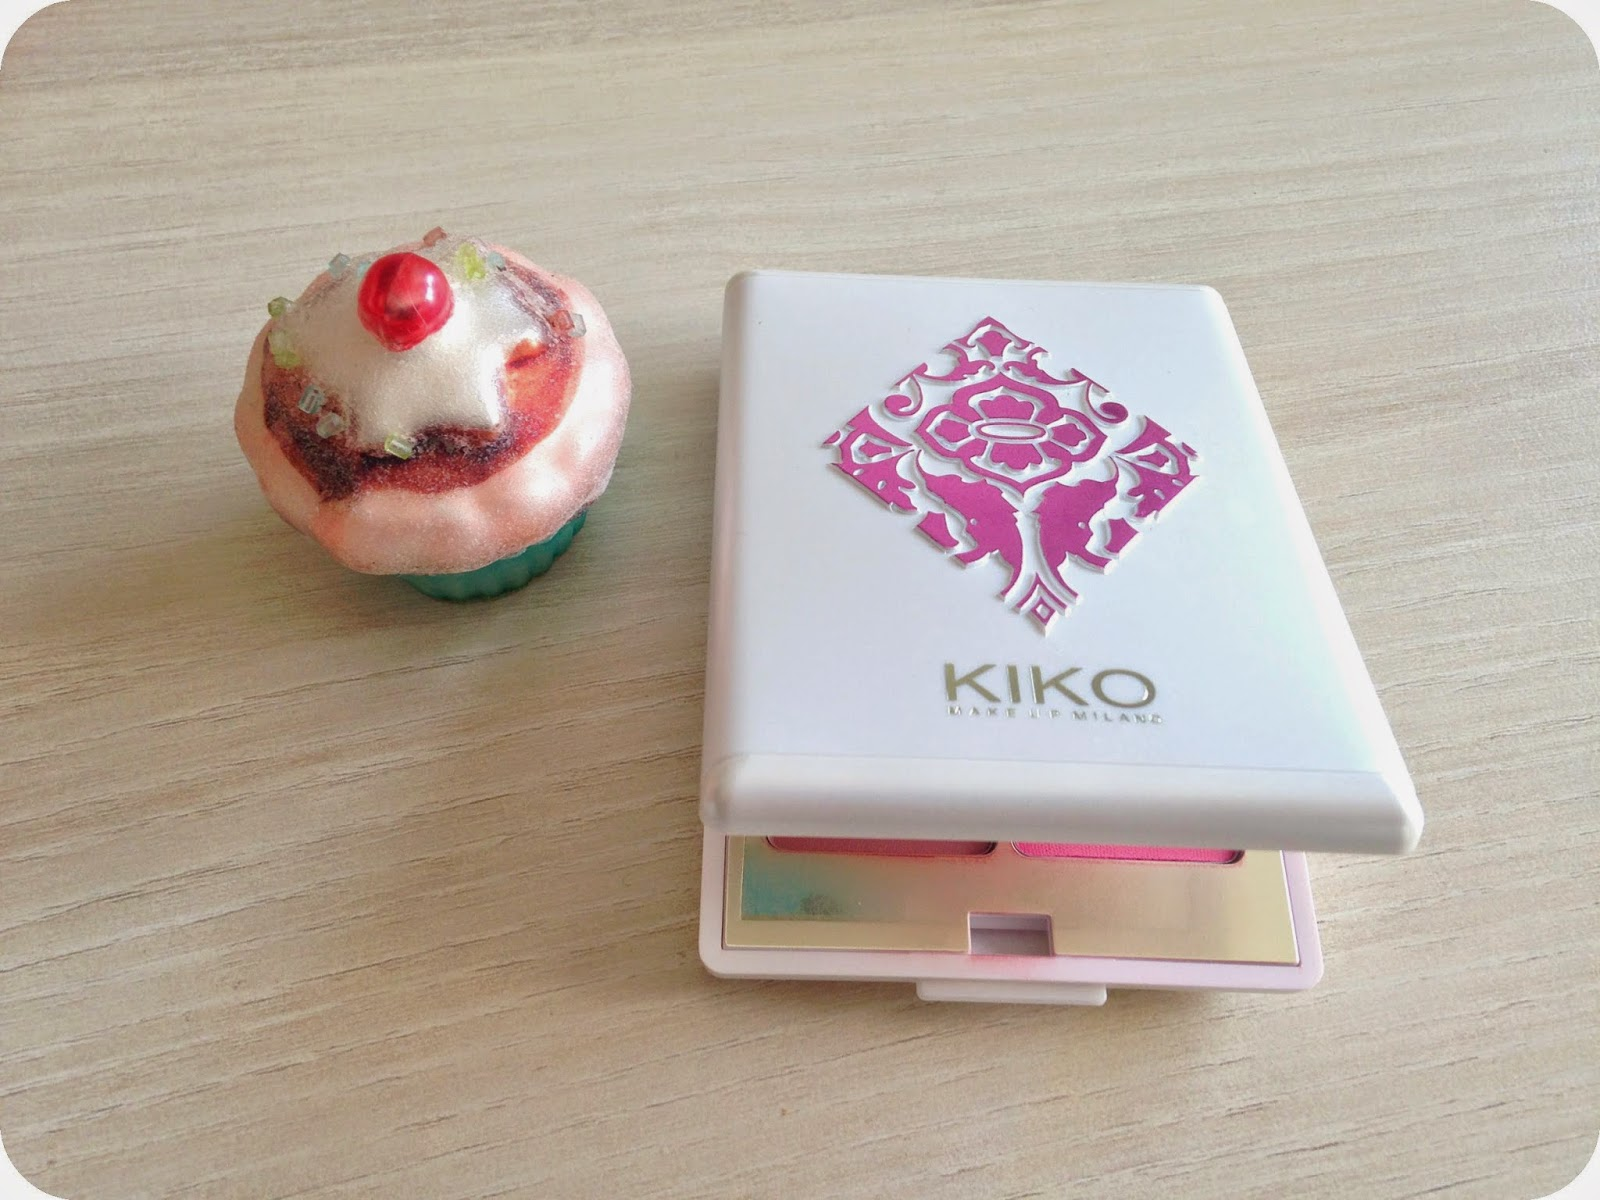 daring games kiko maquillage pas cher